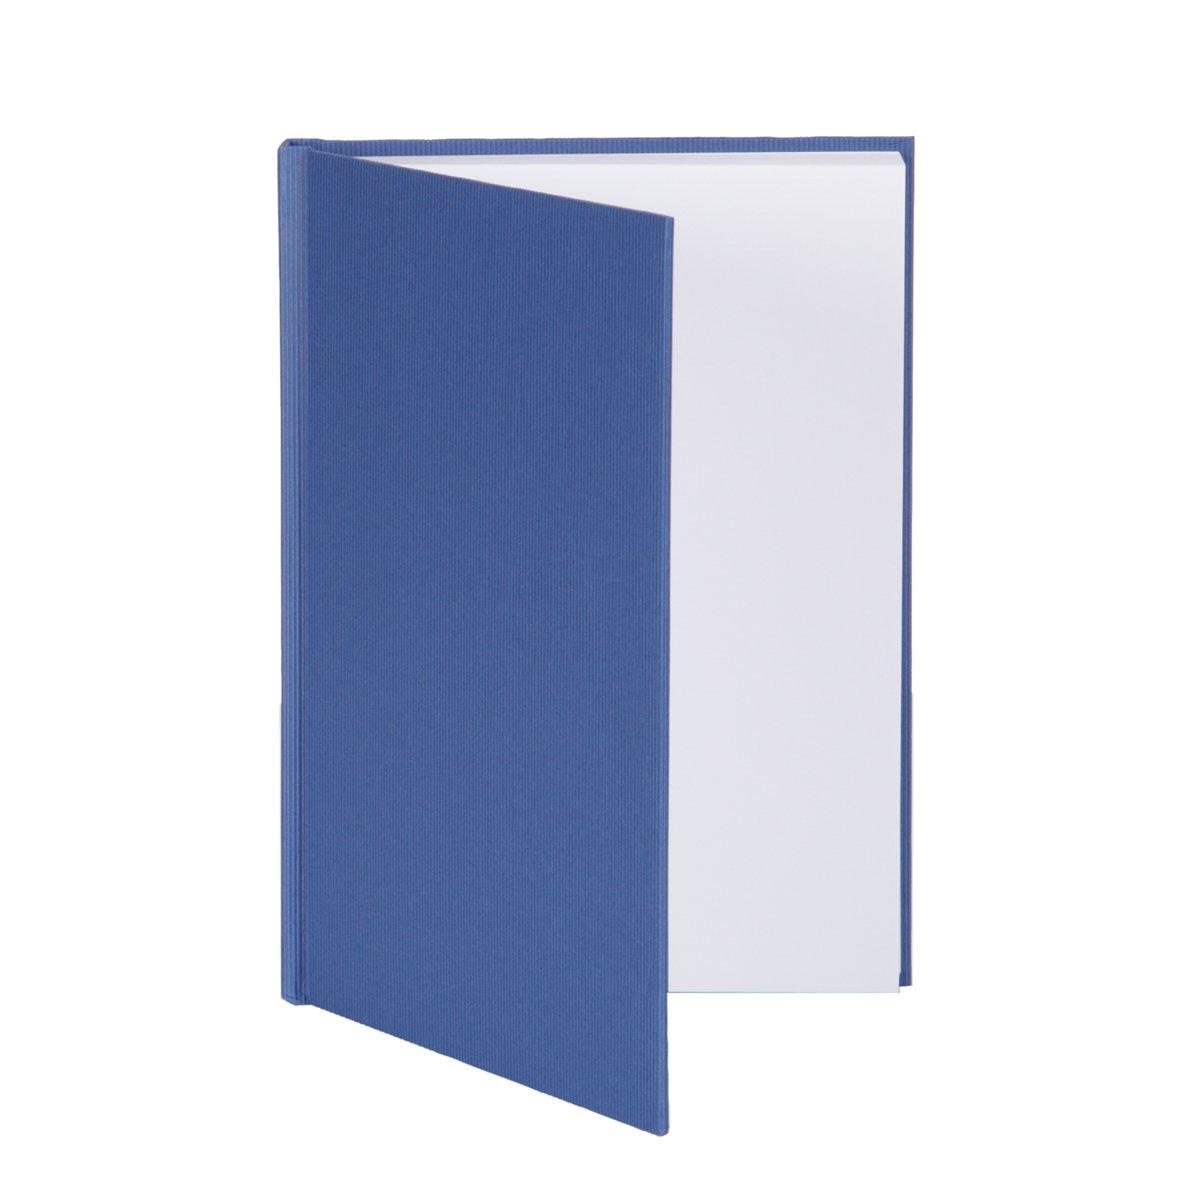 Rössler Papier - - S.O.H.O. Blau - gebundenes Notizbuch DIN A5 - Liefermenge  5 Stück